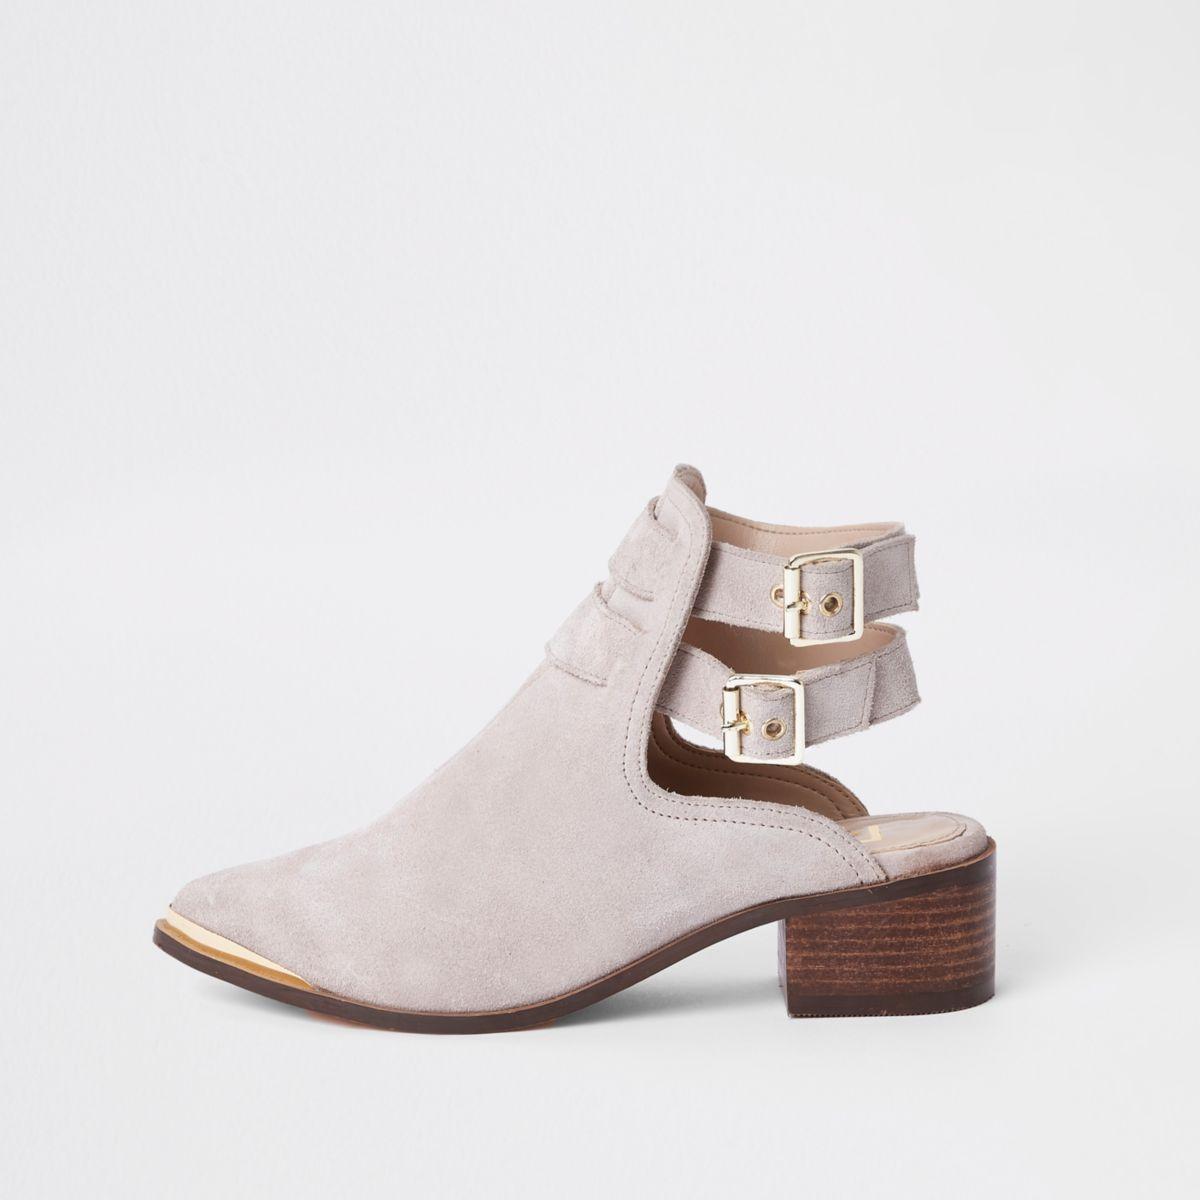 Cream suede double buckle shoe boots